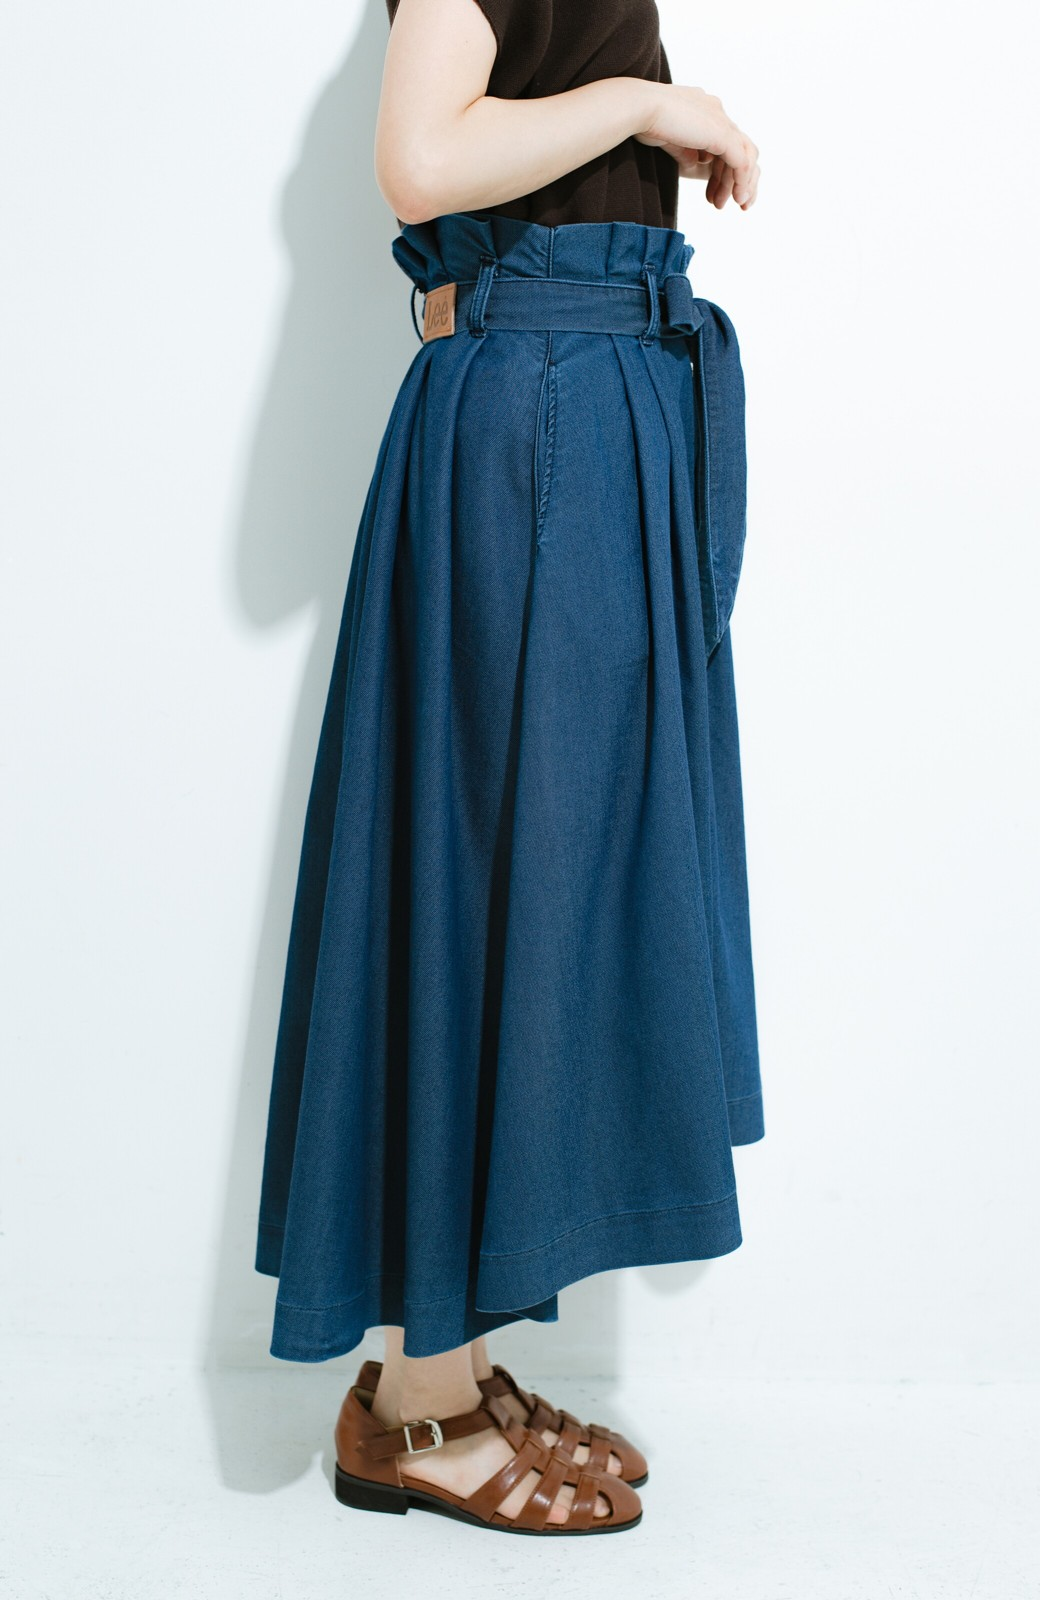 haco! Lady Lee ウエストリボンのペーパーバッグスカート <ブルー>の商品写真5